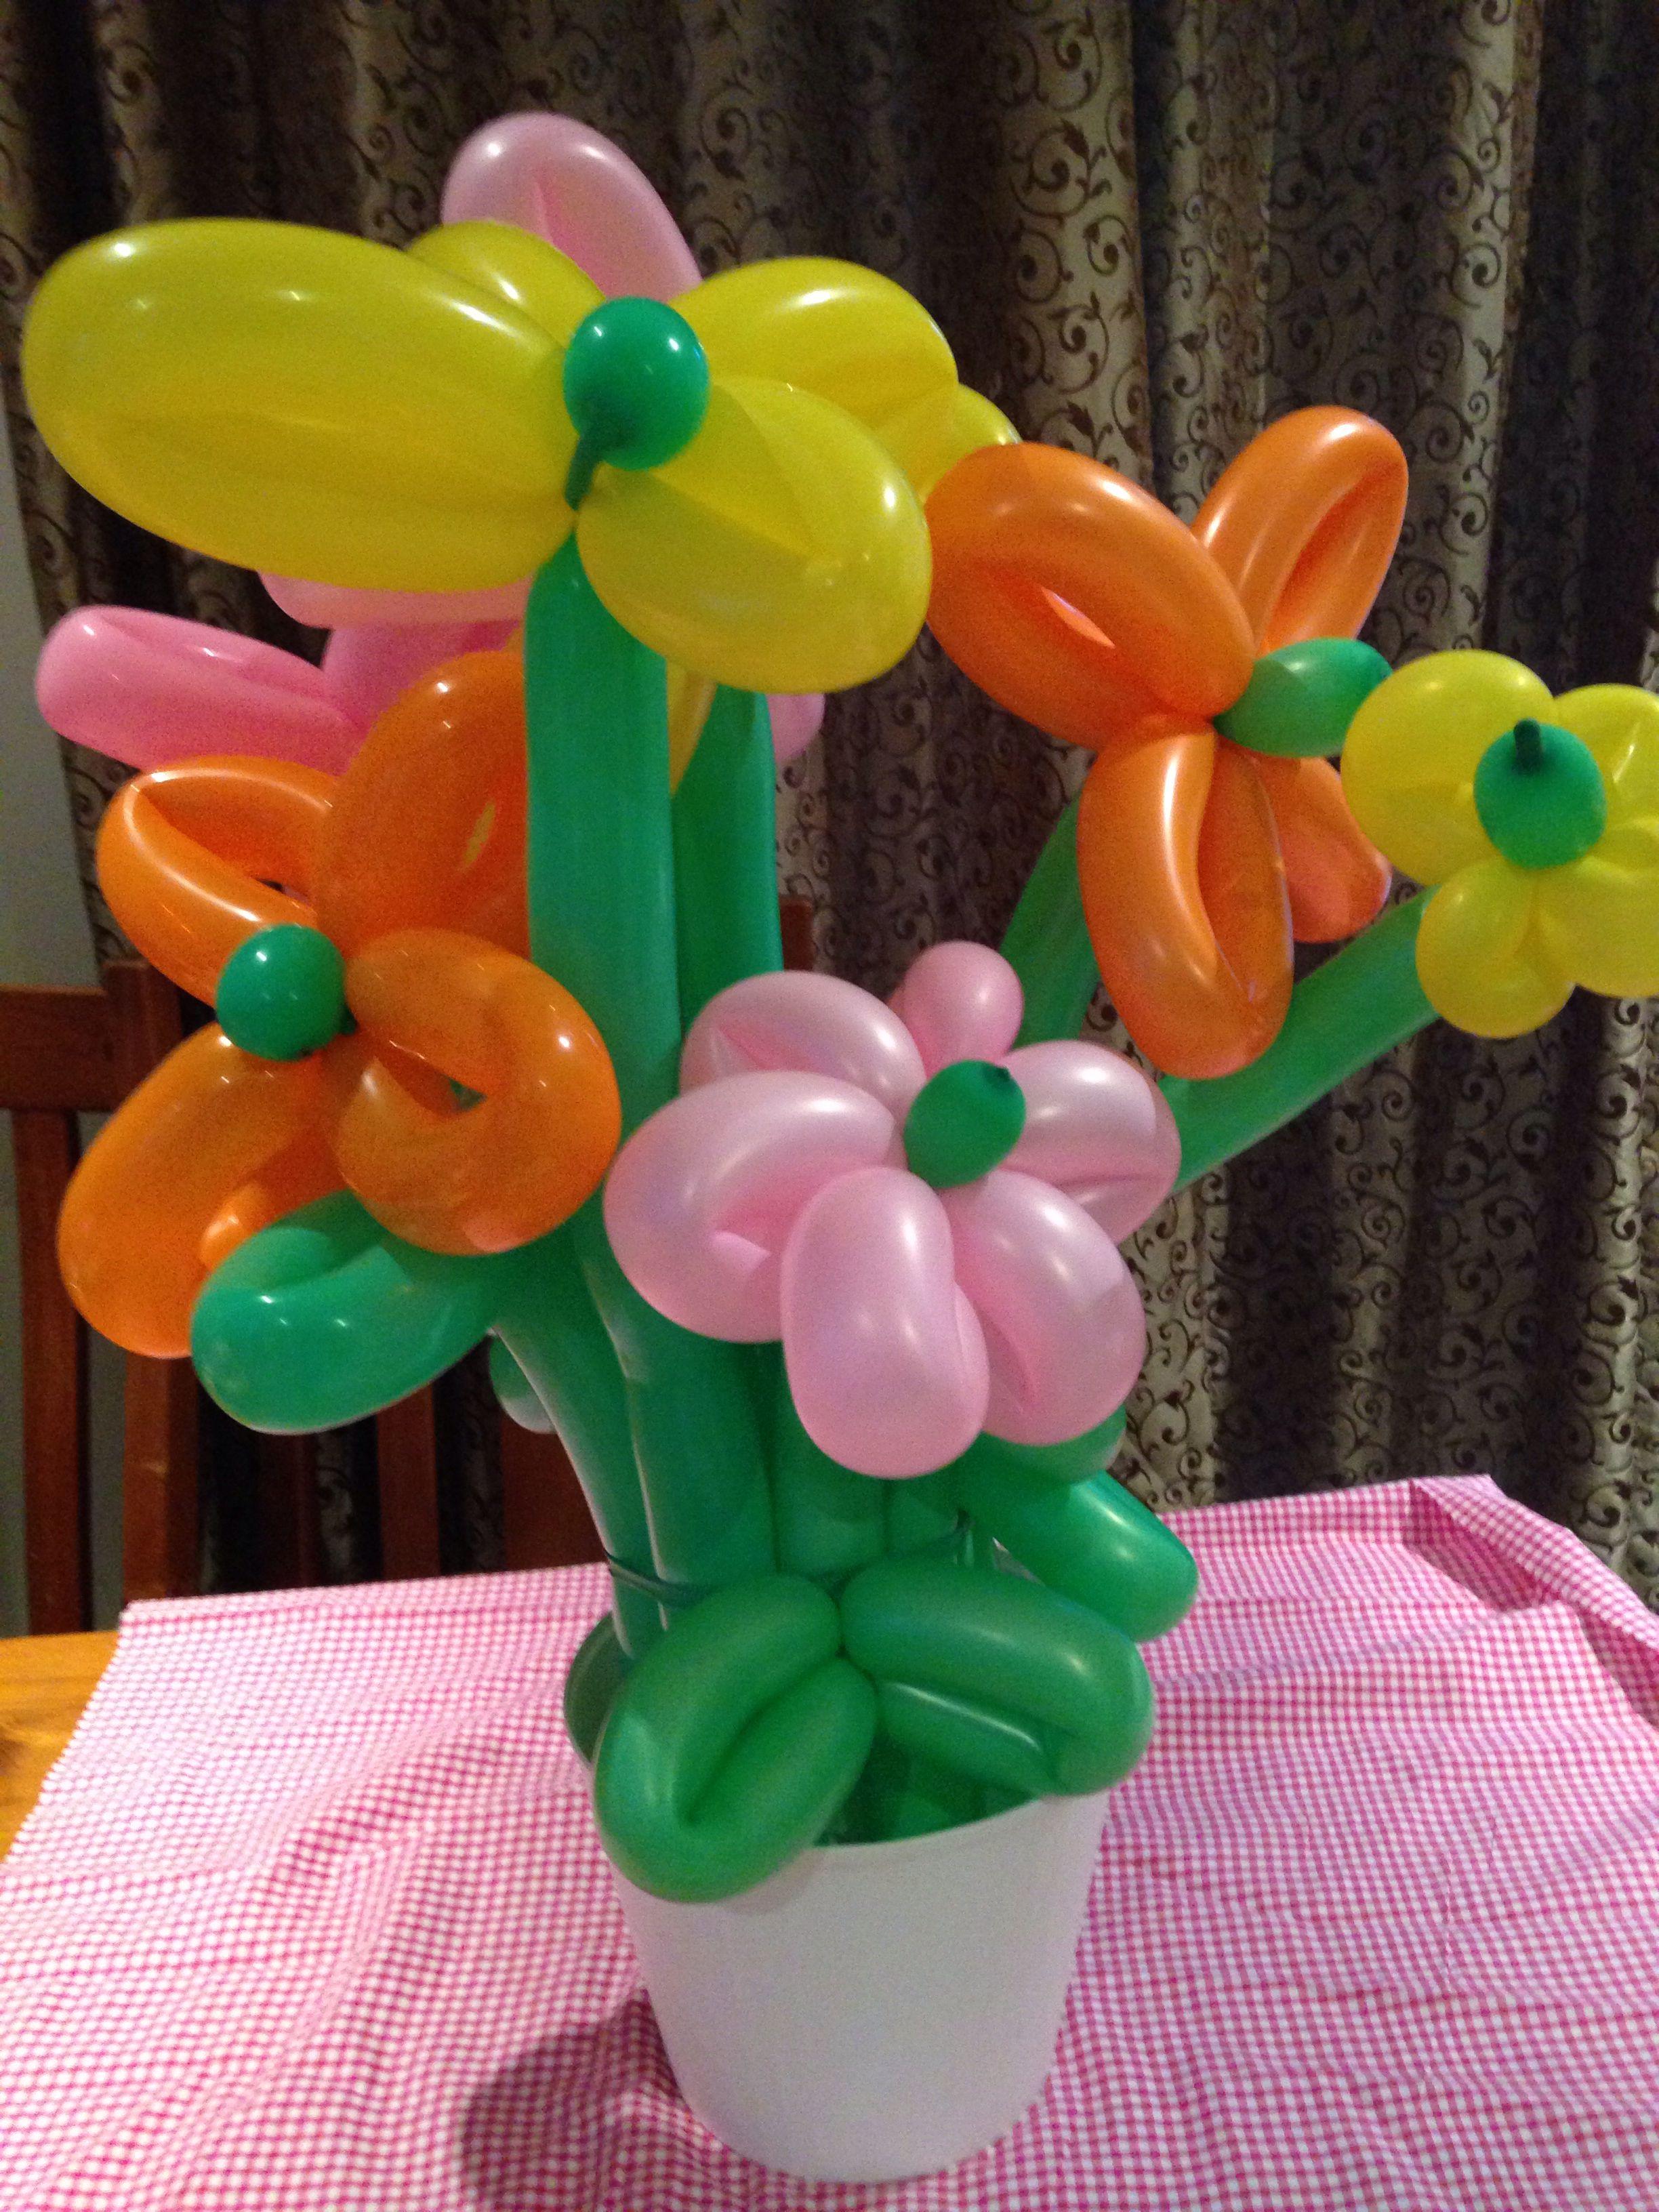 Balloon boquet for buffet centerpiece pink orange